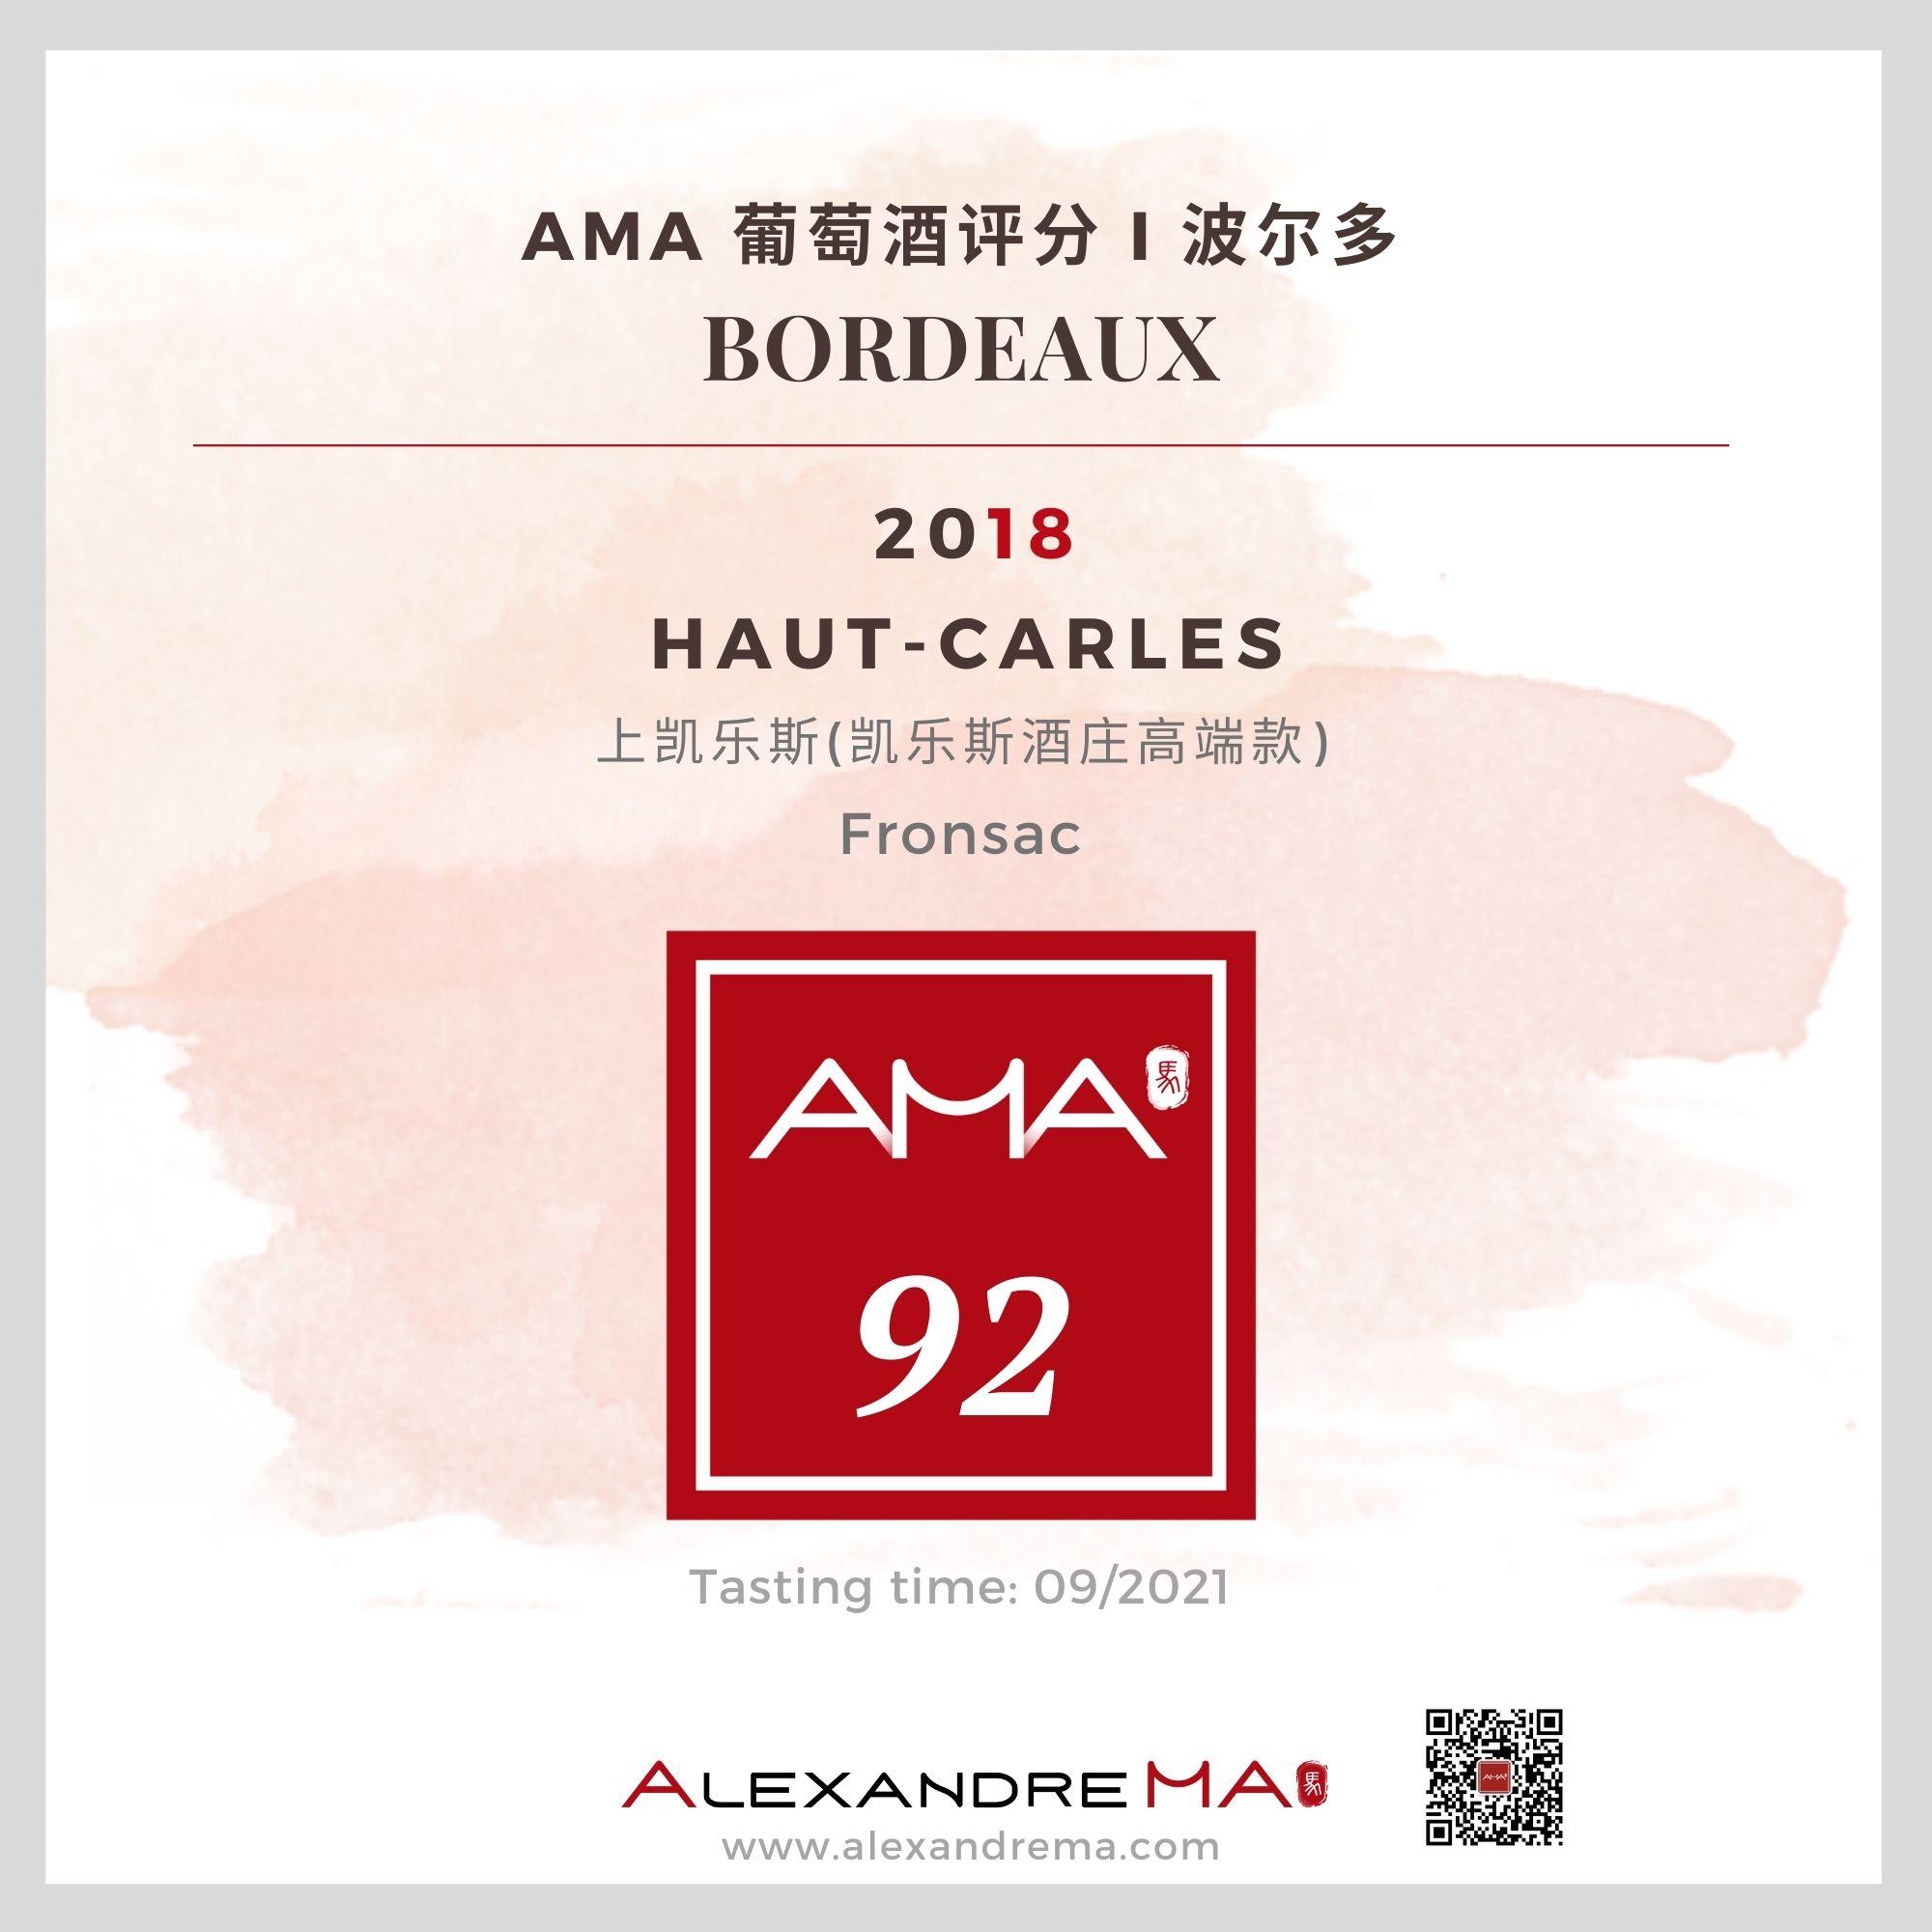 Haut-Carles 2018 上凯乐斯 - Alexandre Ma